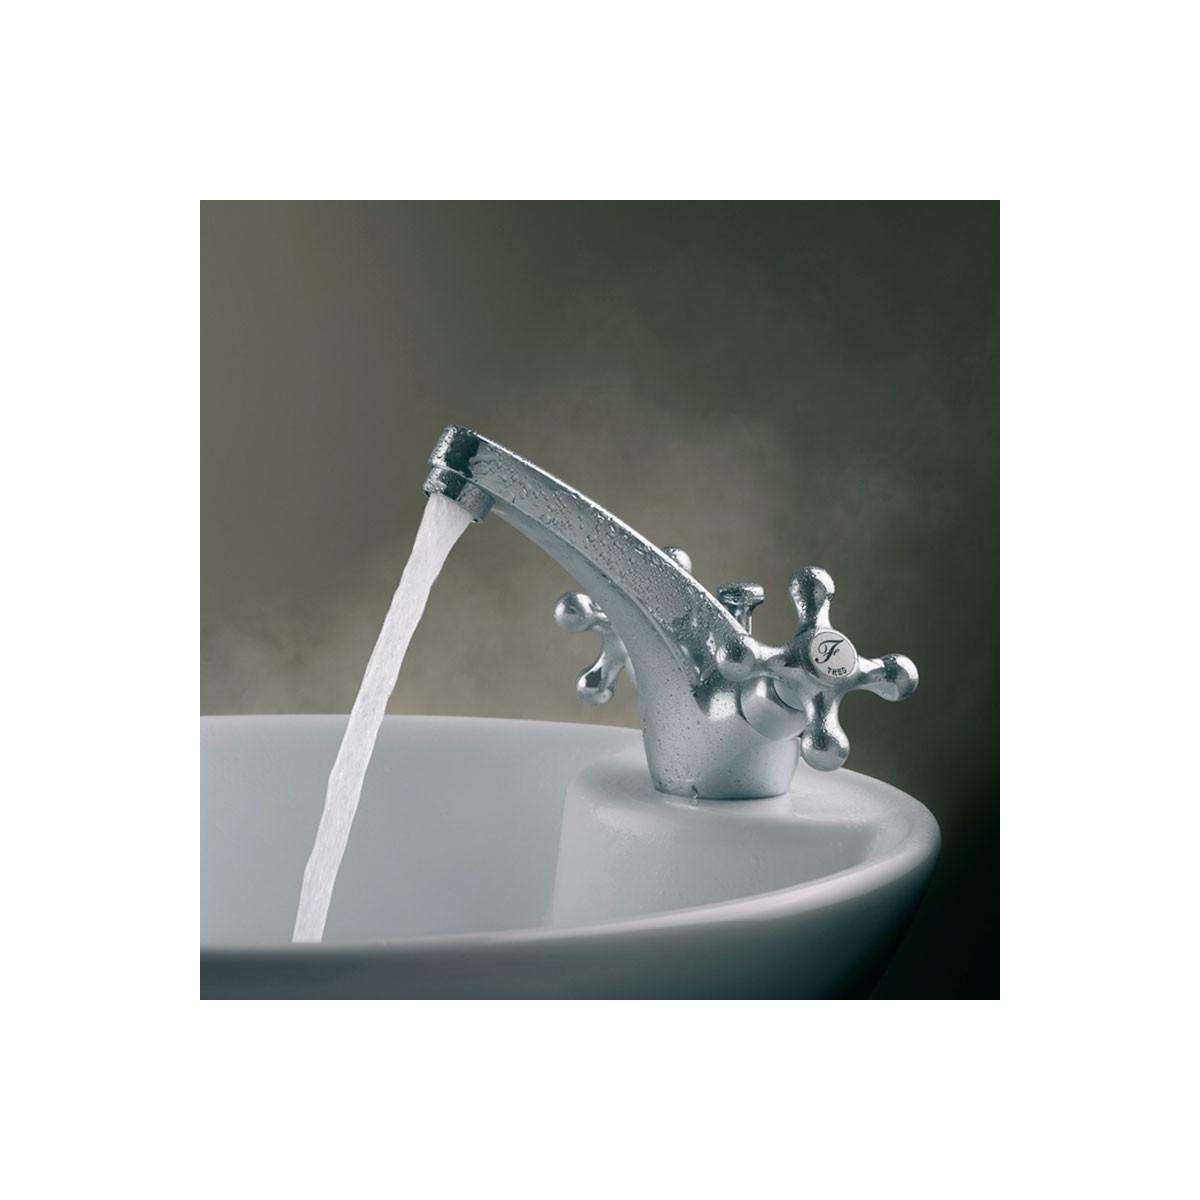 Bimando lavabo Clasic-Tres